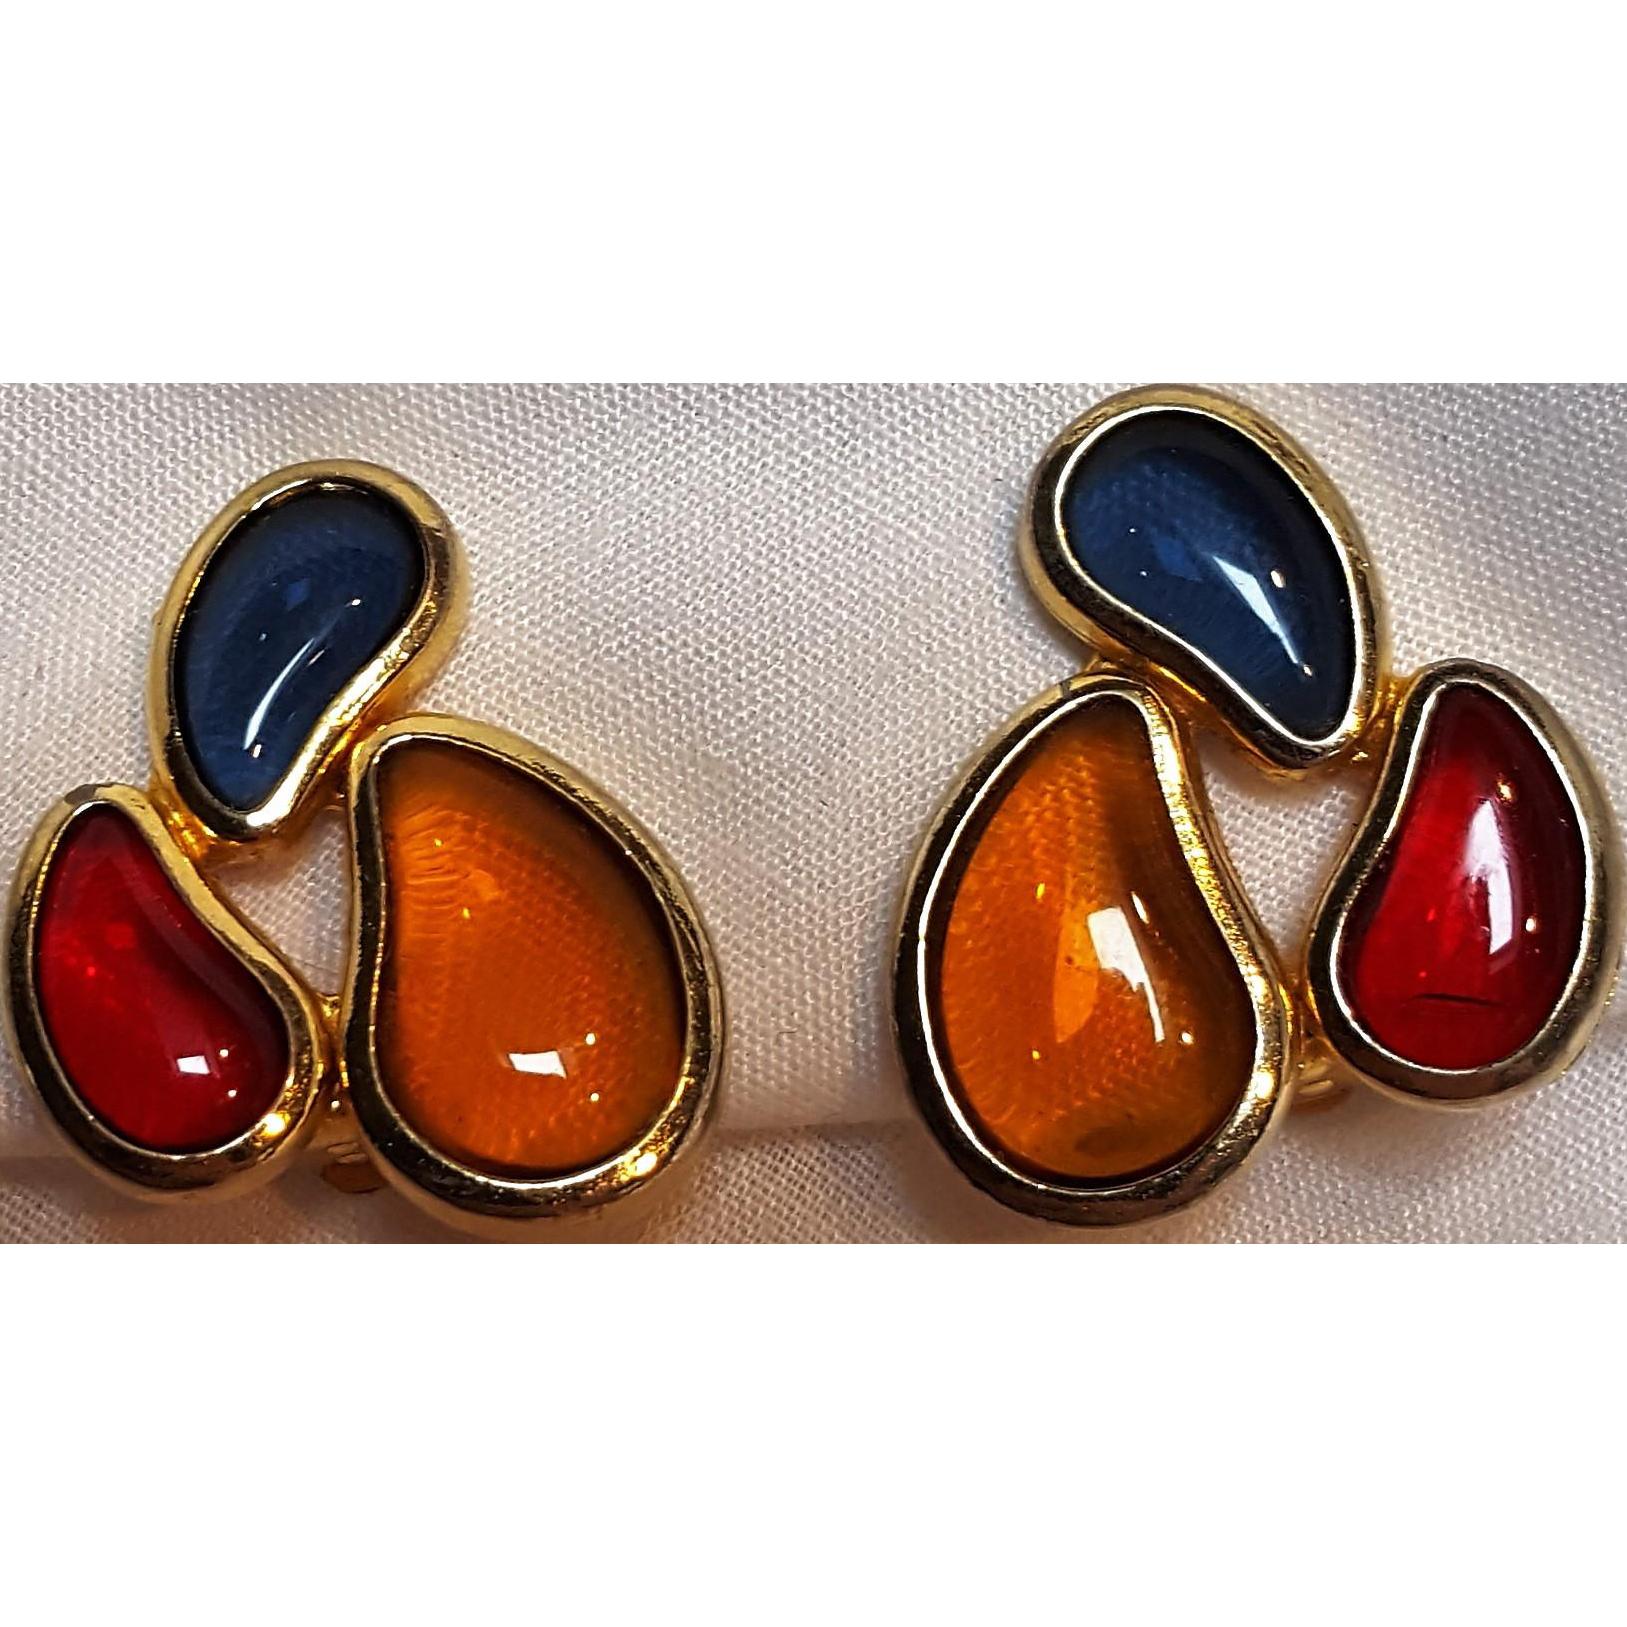 Les Bernard clip earrings poured glass stones red blue amber